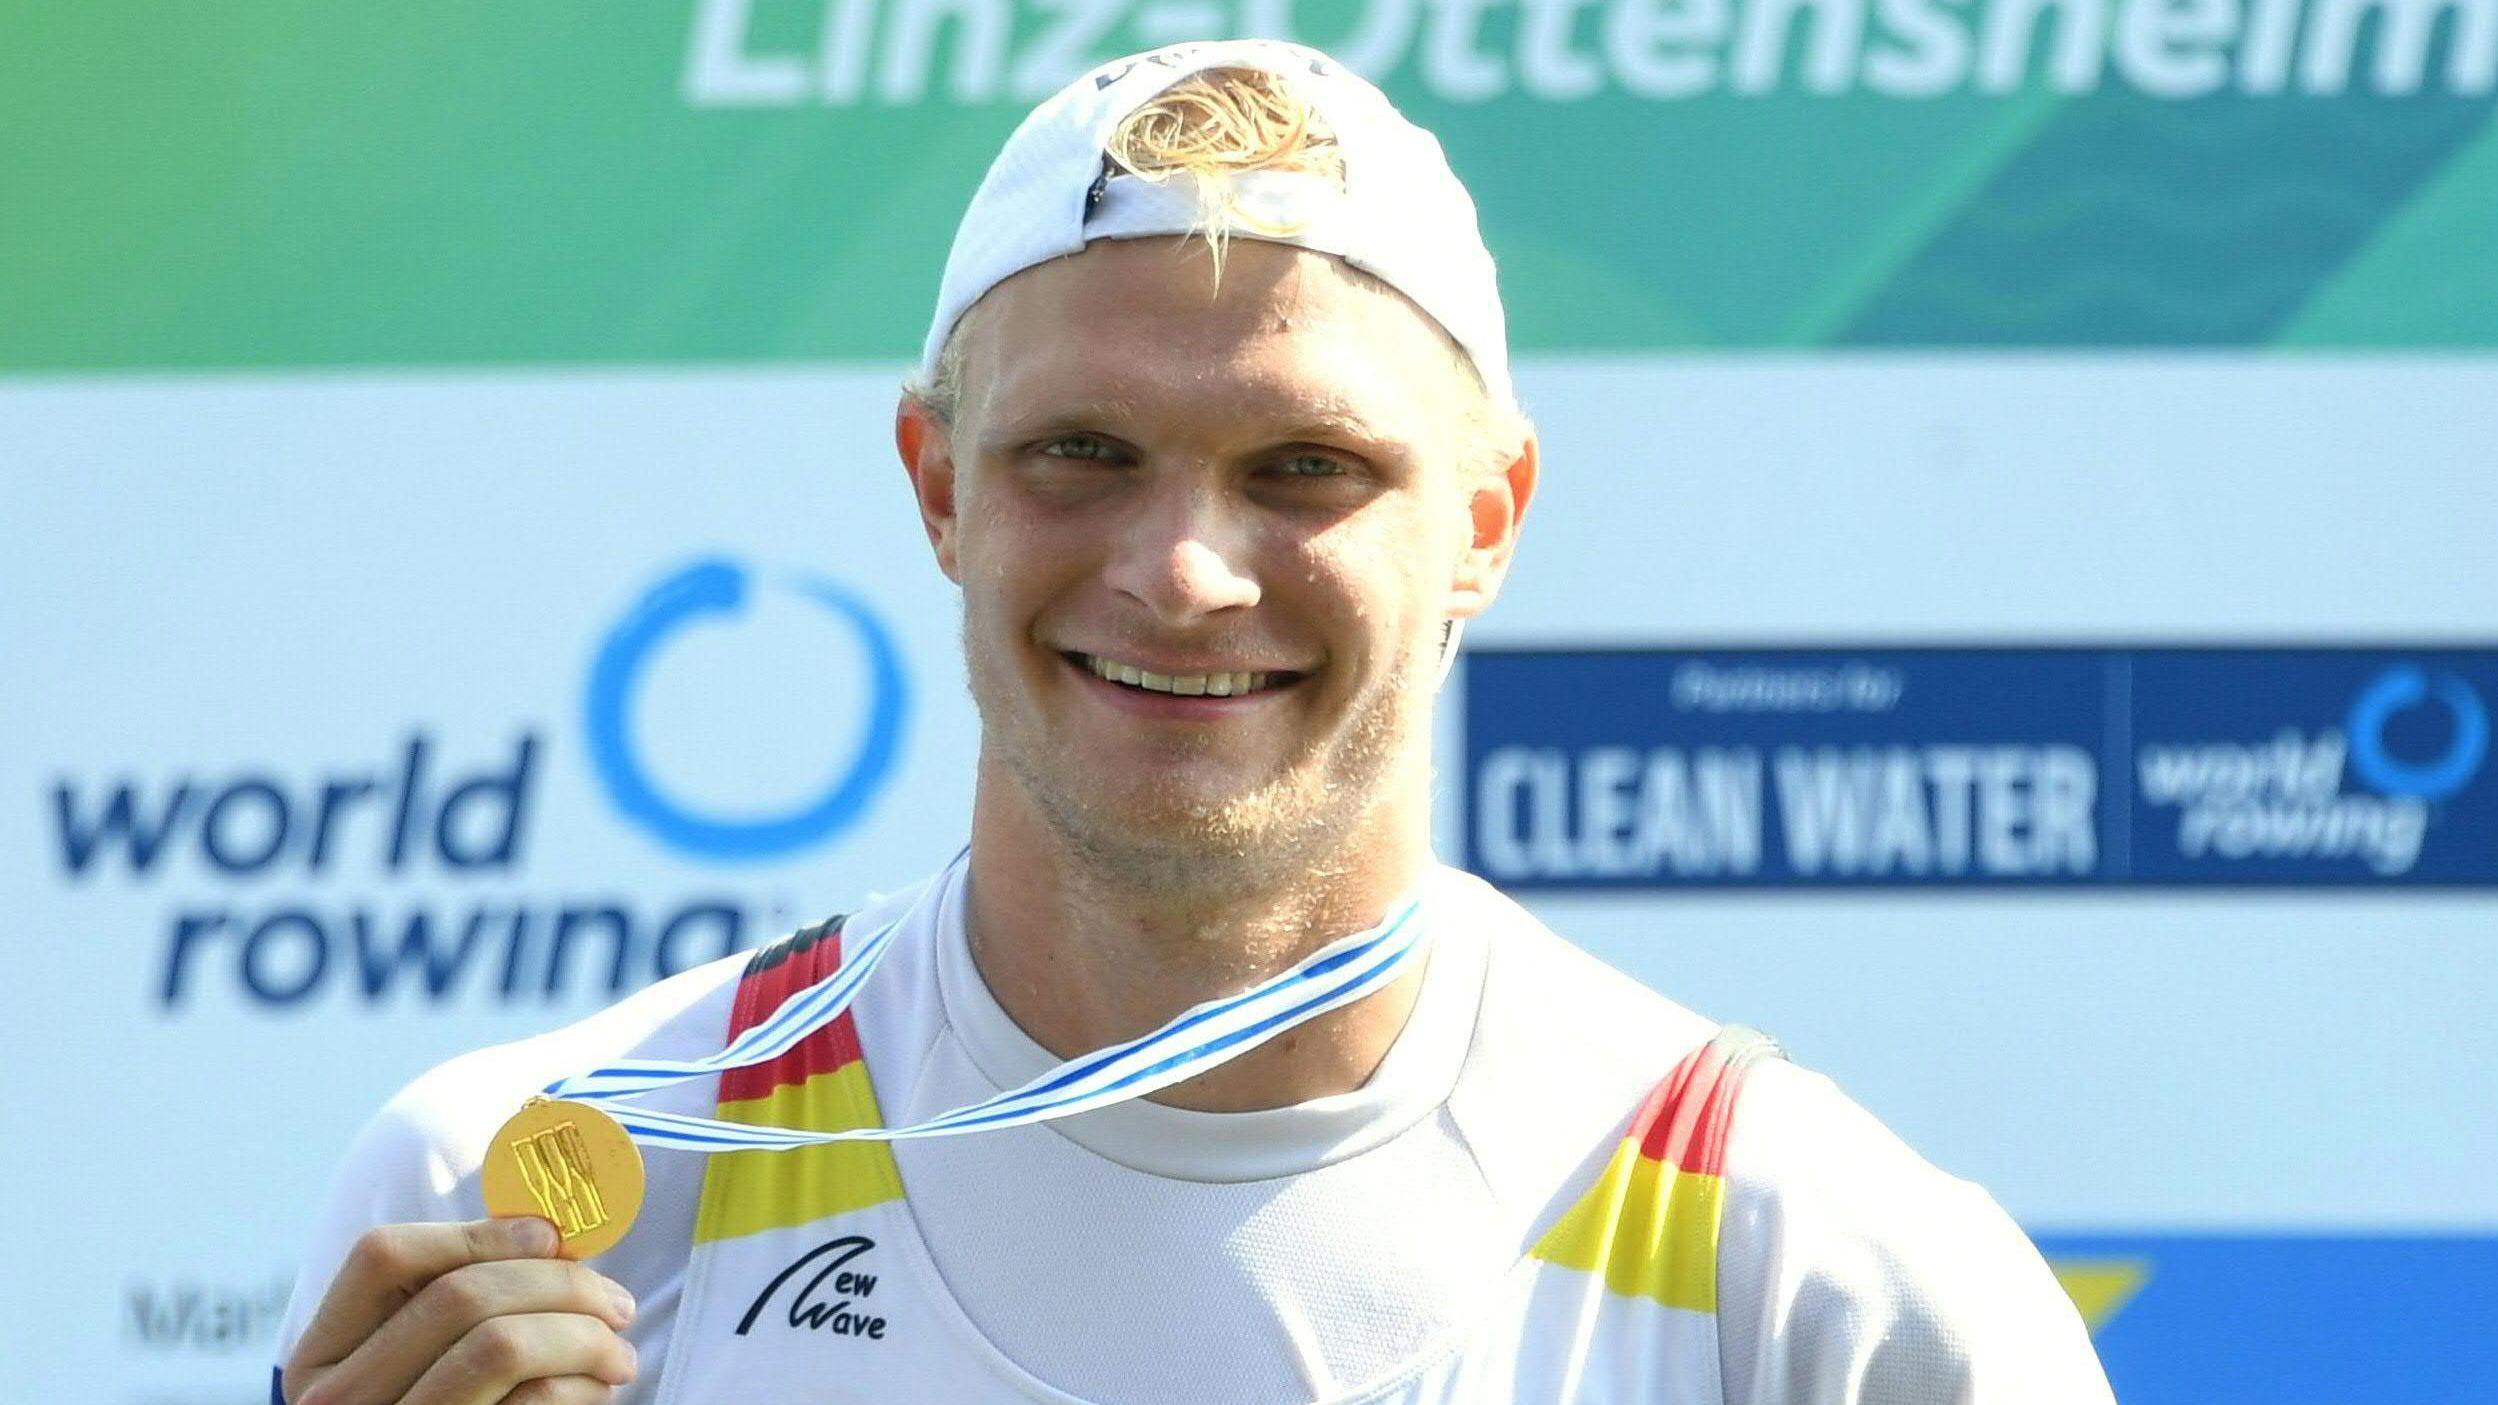 Ruder-Weltmeister Oliver Zeidler mit Goldmedaille